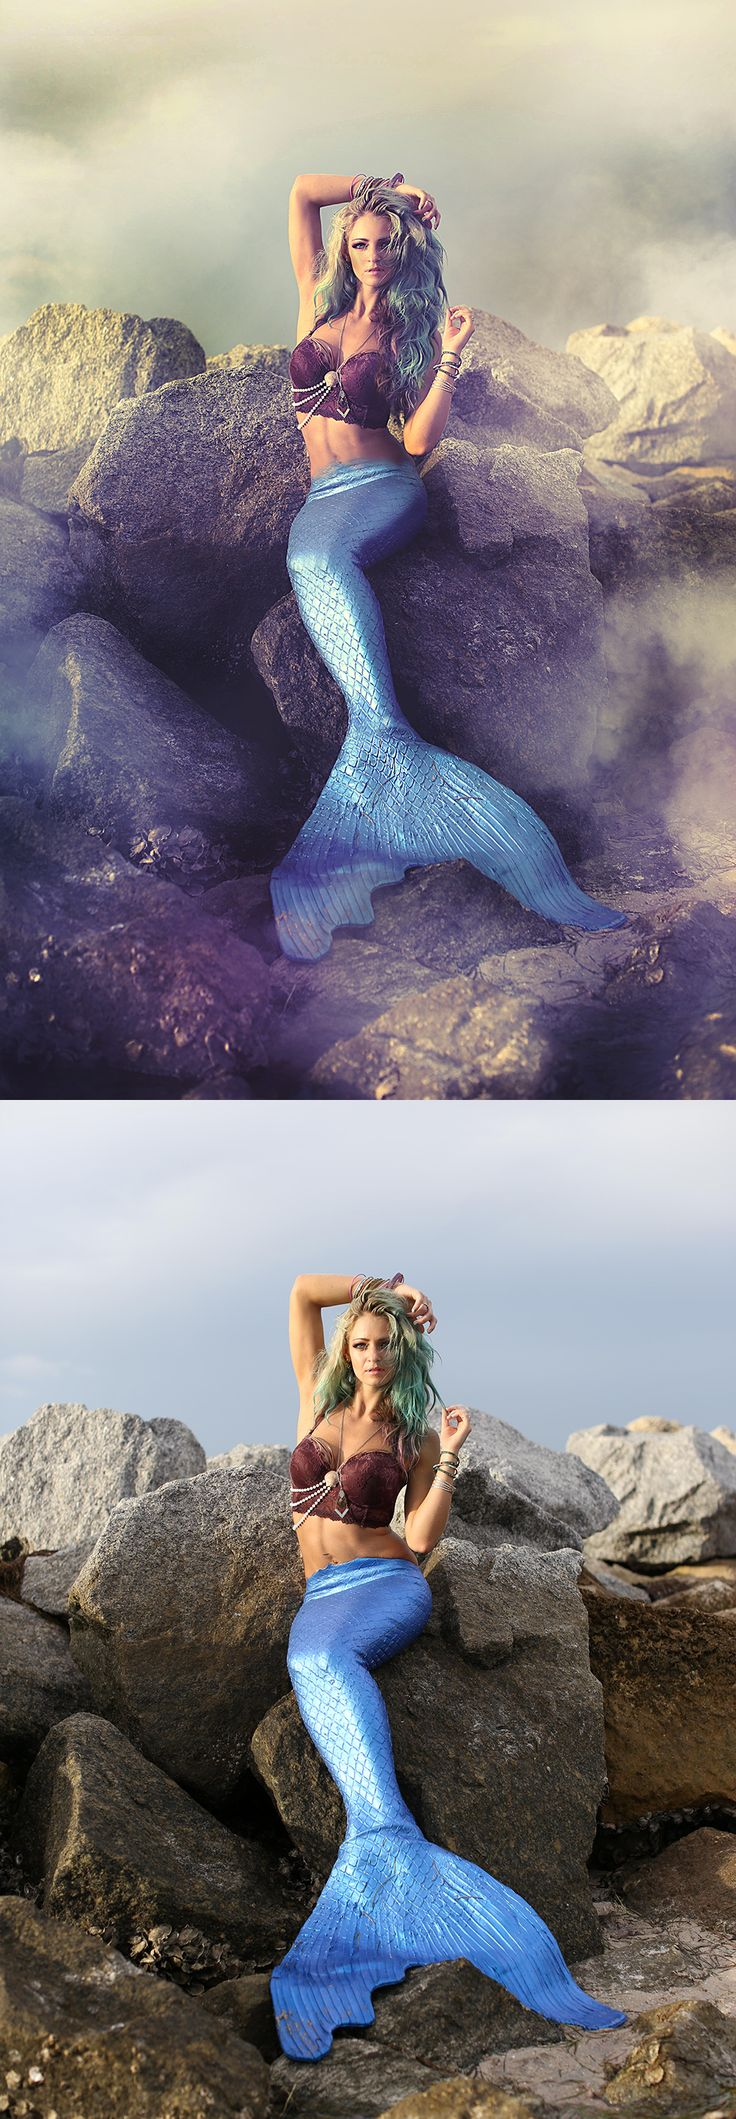 Photoshop retouching for a mermaid photo-shoot.